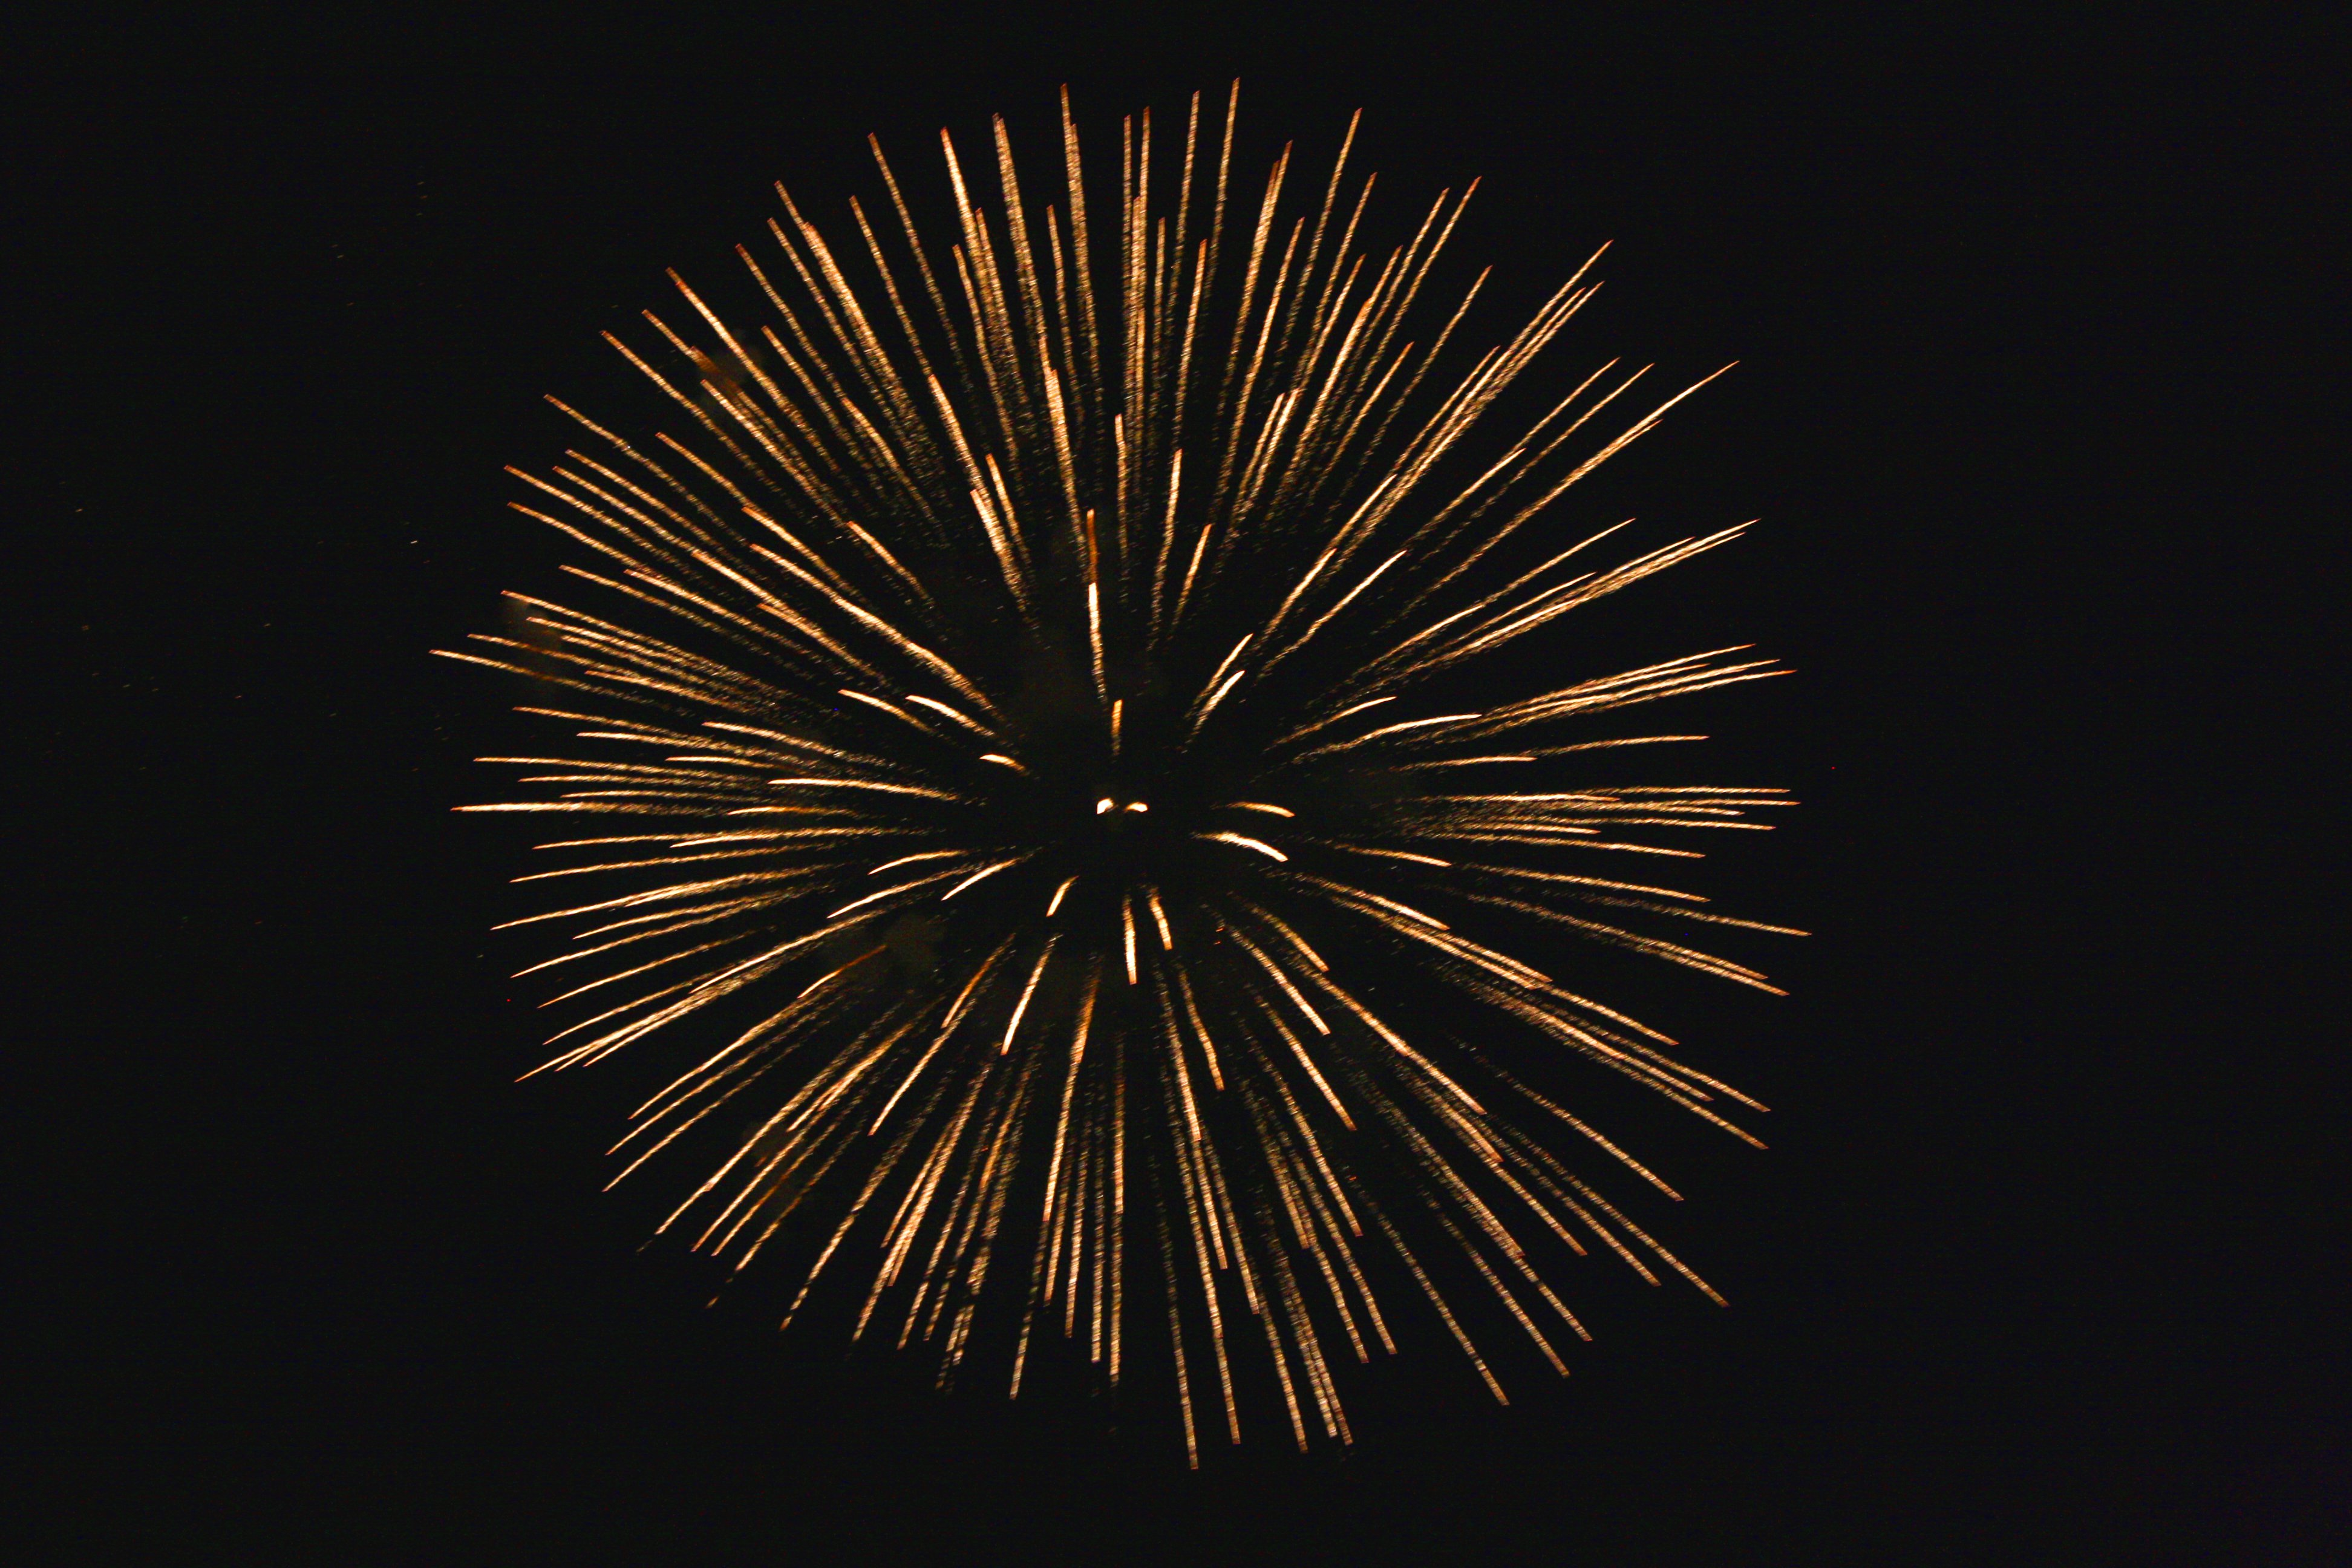 golden starburst fireworks picture free photograph photos public